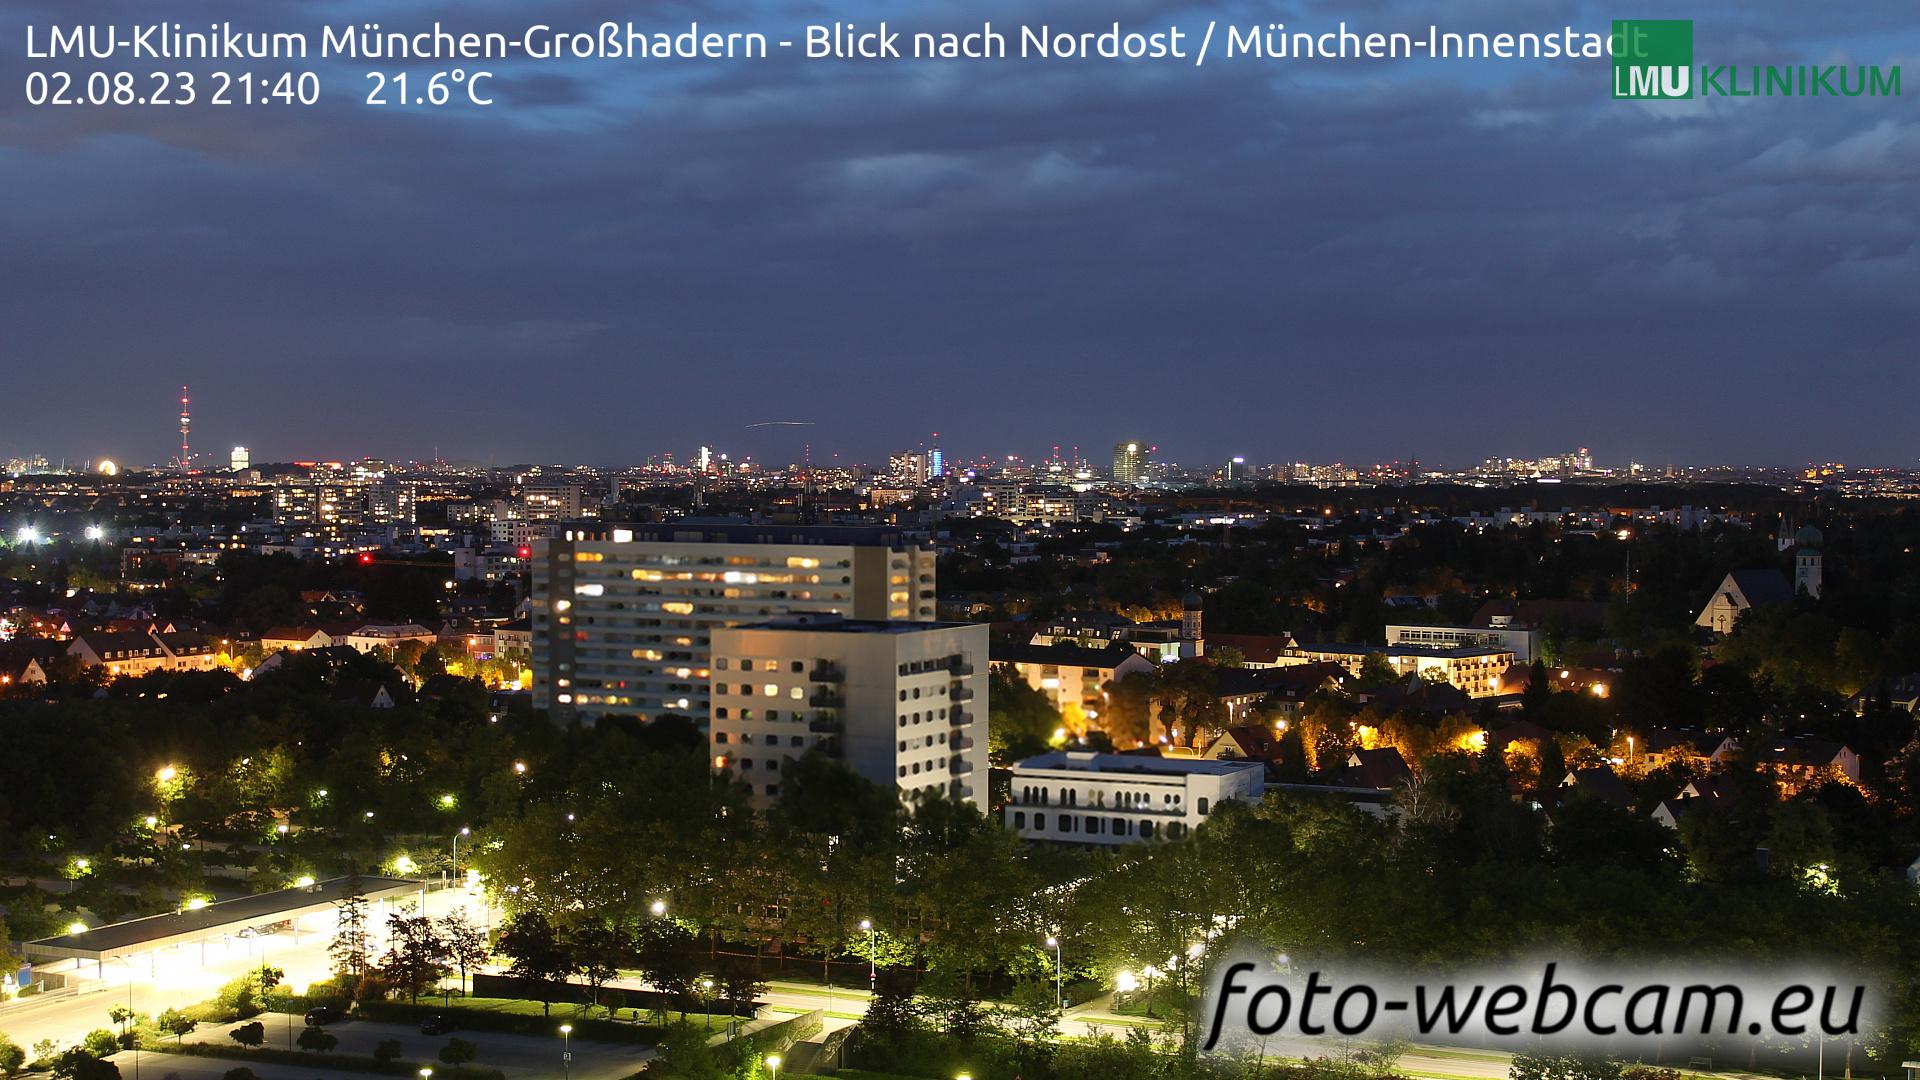 Munich Mon. 21:47